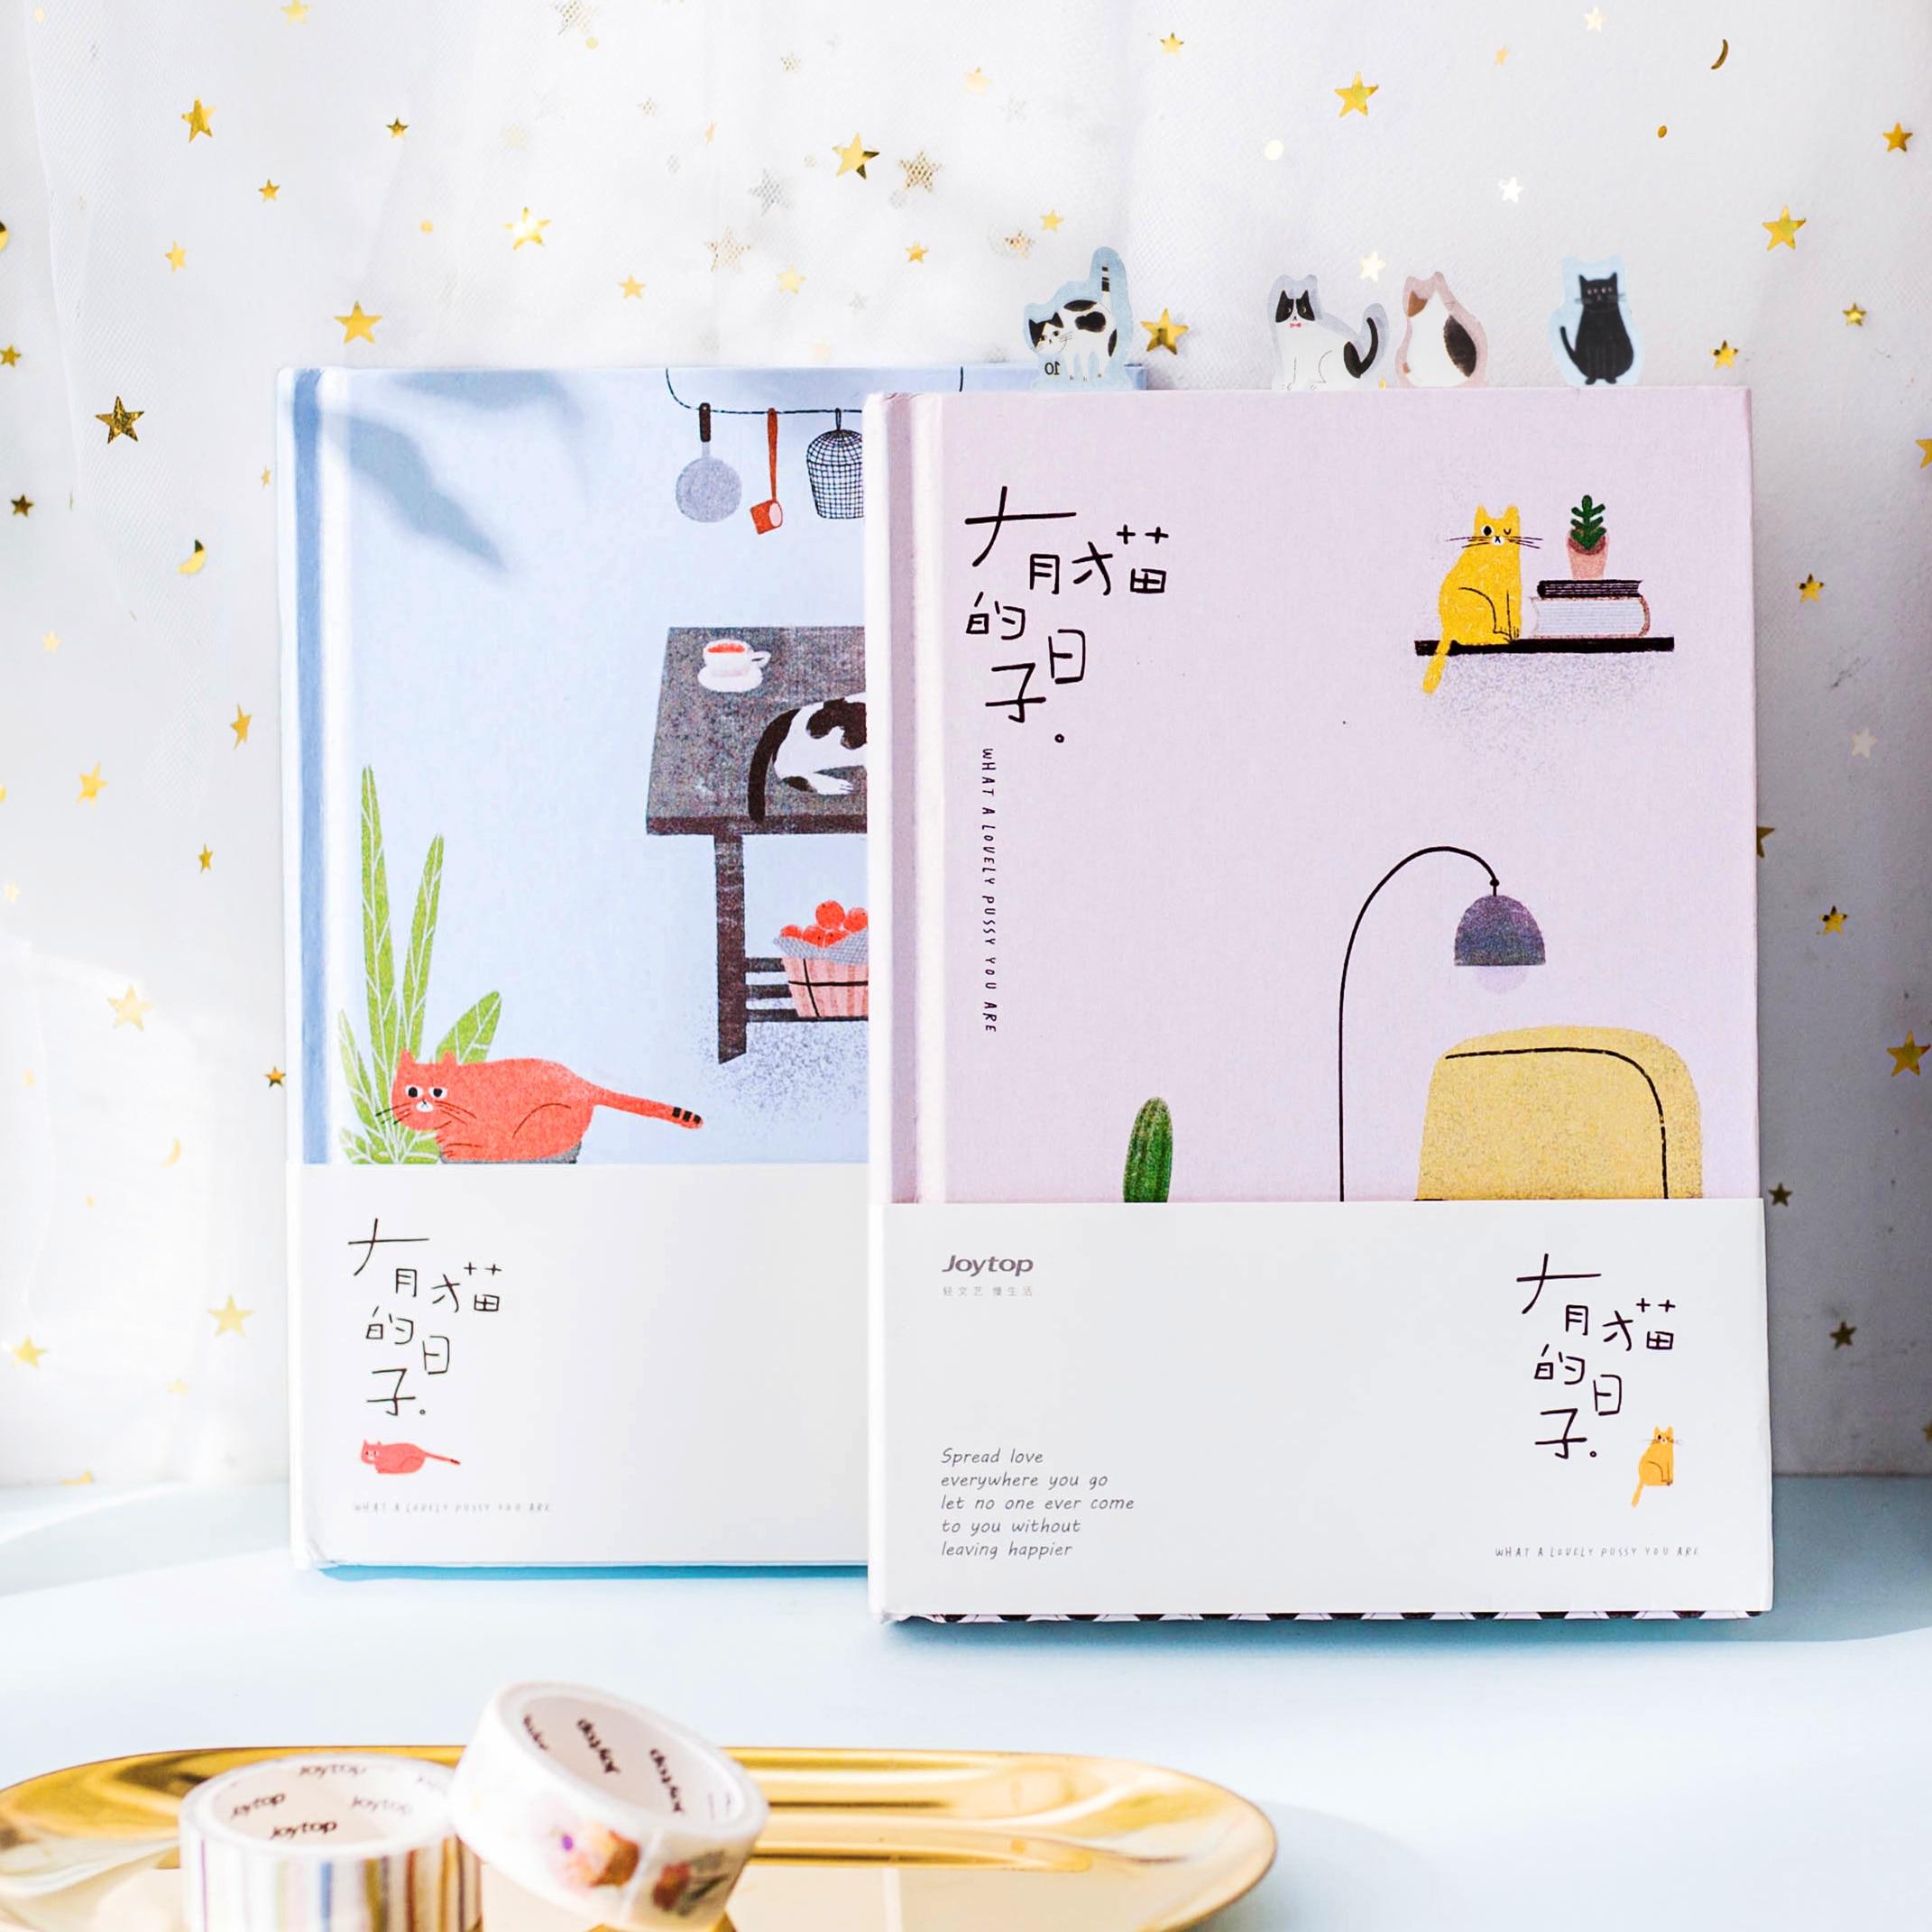 2019 de Corea Kawaii lindo gato casa horario diario Personal organizador planificador cuaderno Planbook A5 mejor para regalo de Estudiante